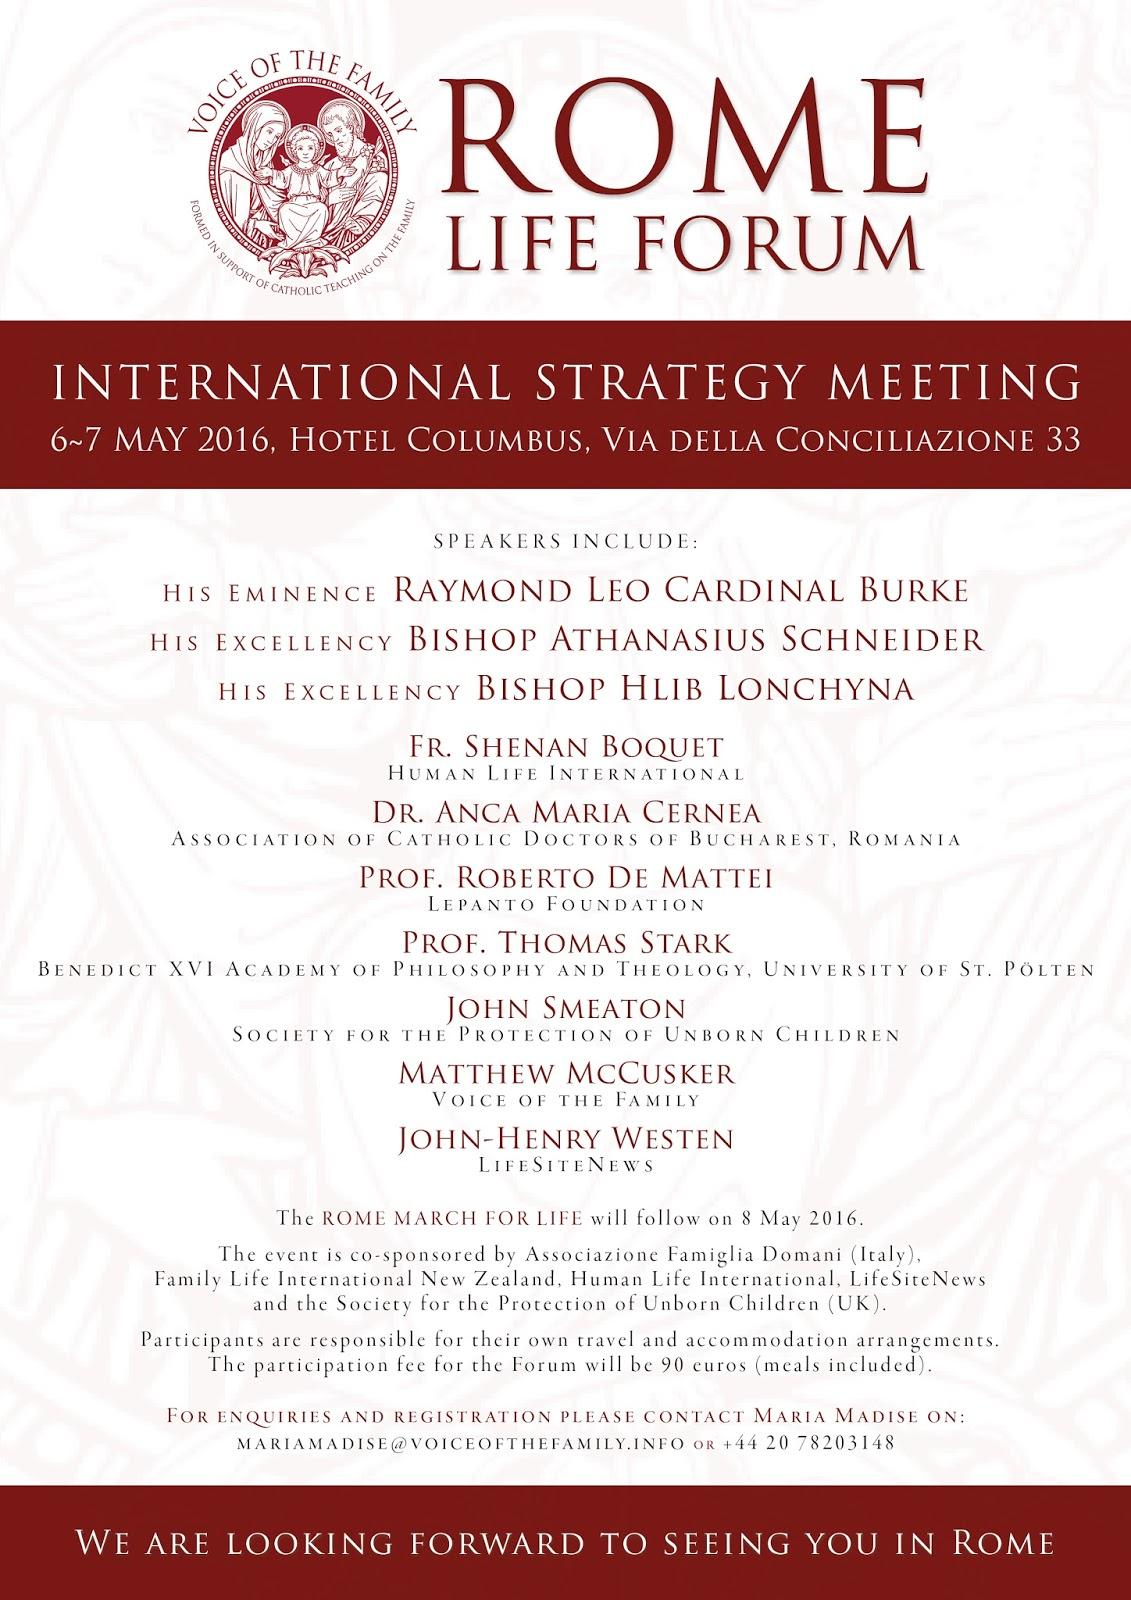 ROME LIFE FORUM 2016 LEAFLET